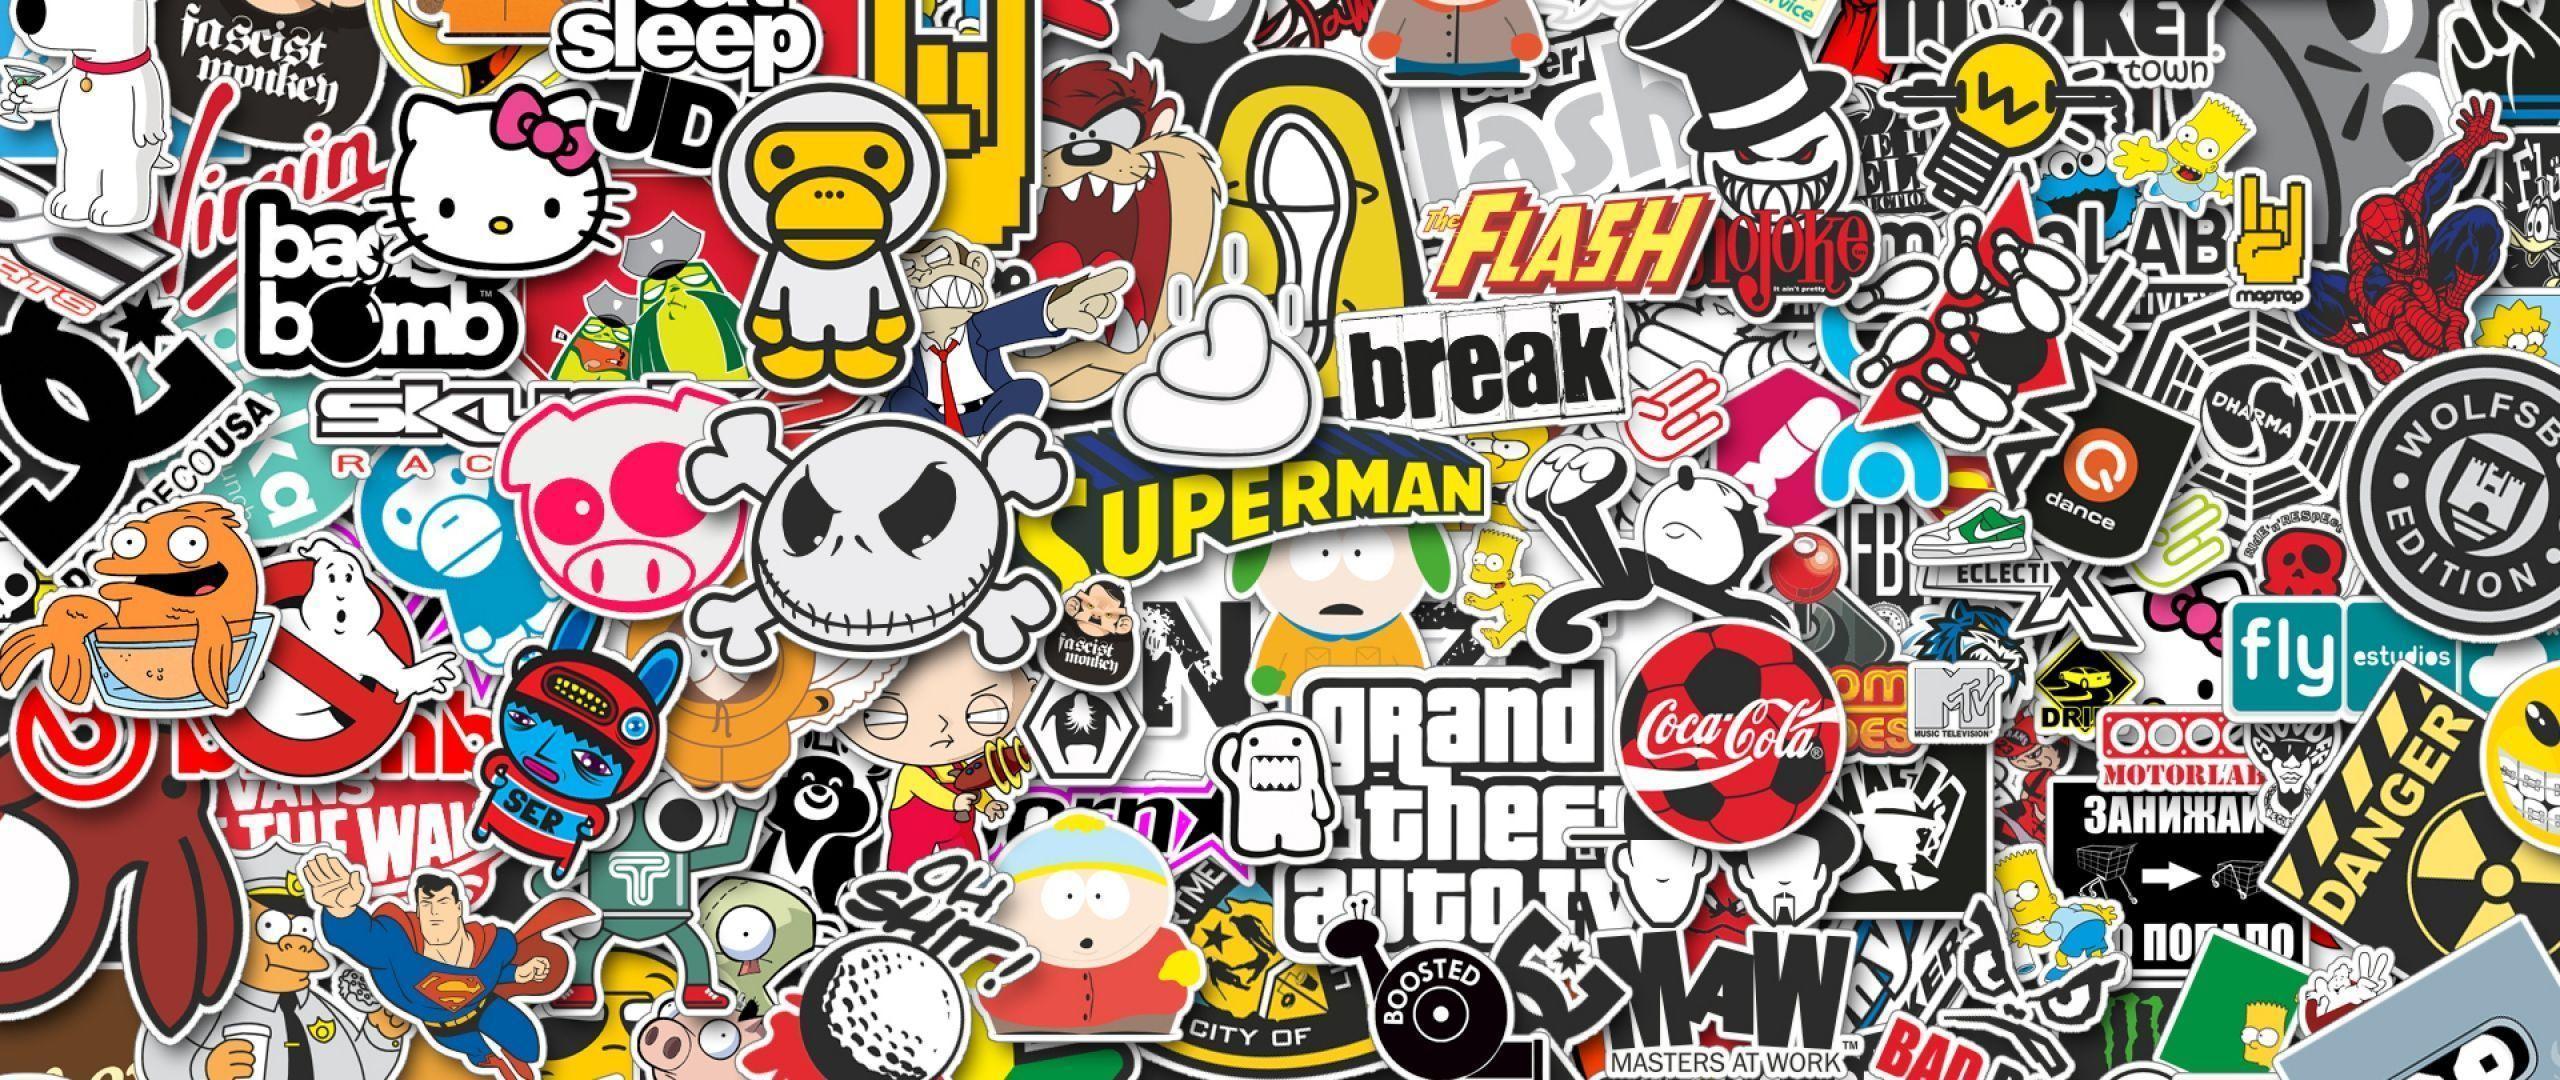 Jdm sticker wallpapers group 62